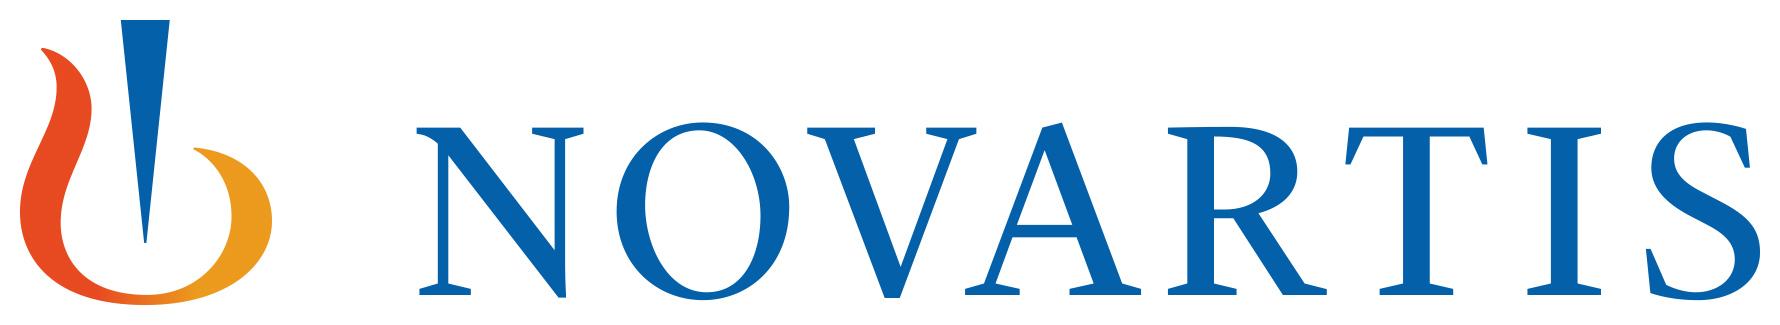 Novartis - Reimagining Medicine